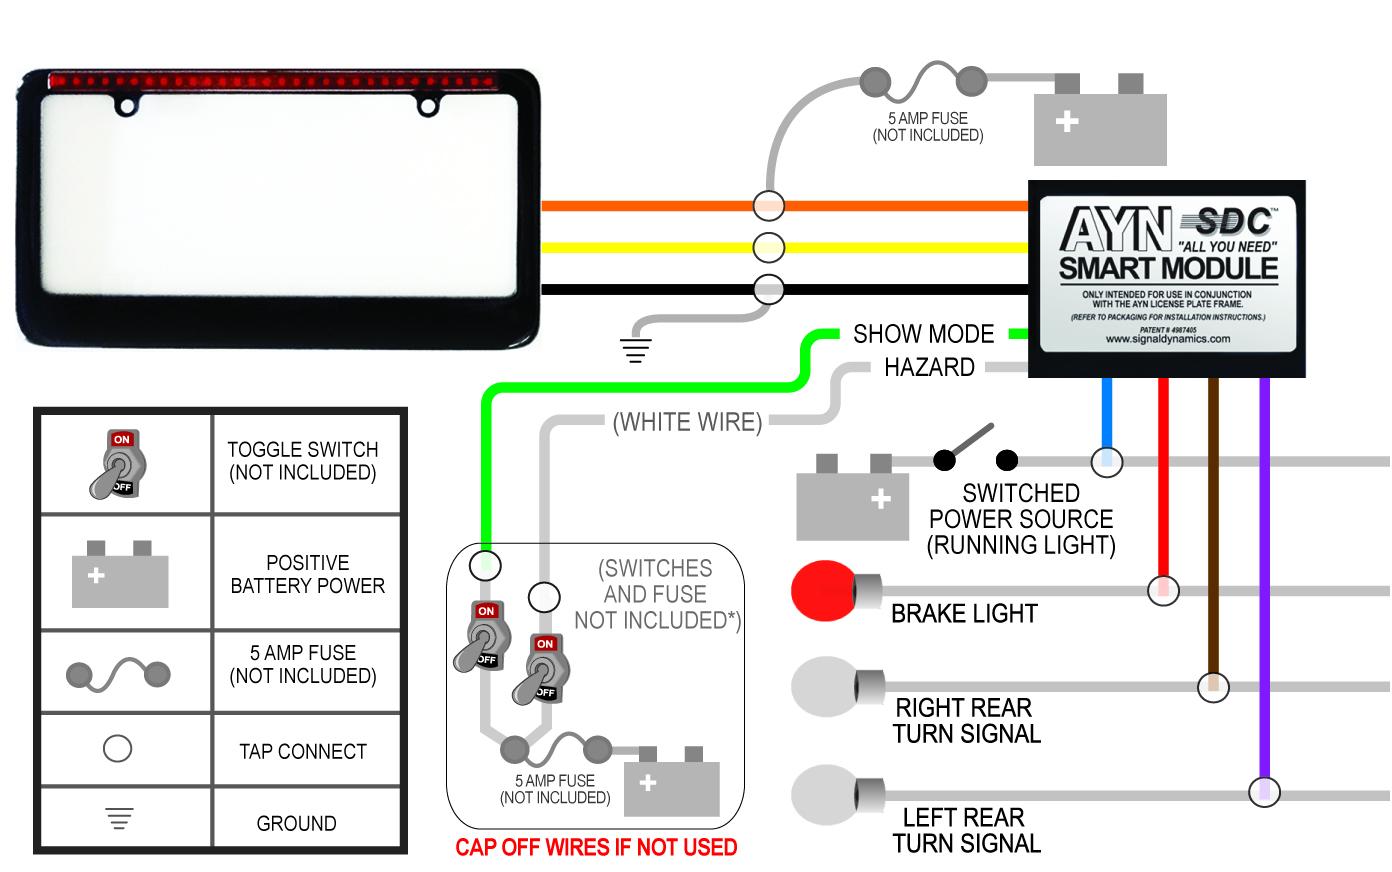 black auto wiring diagram jpg [ 1392 x 872 Pixel ]